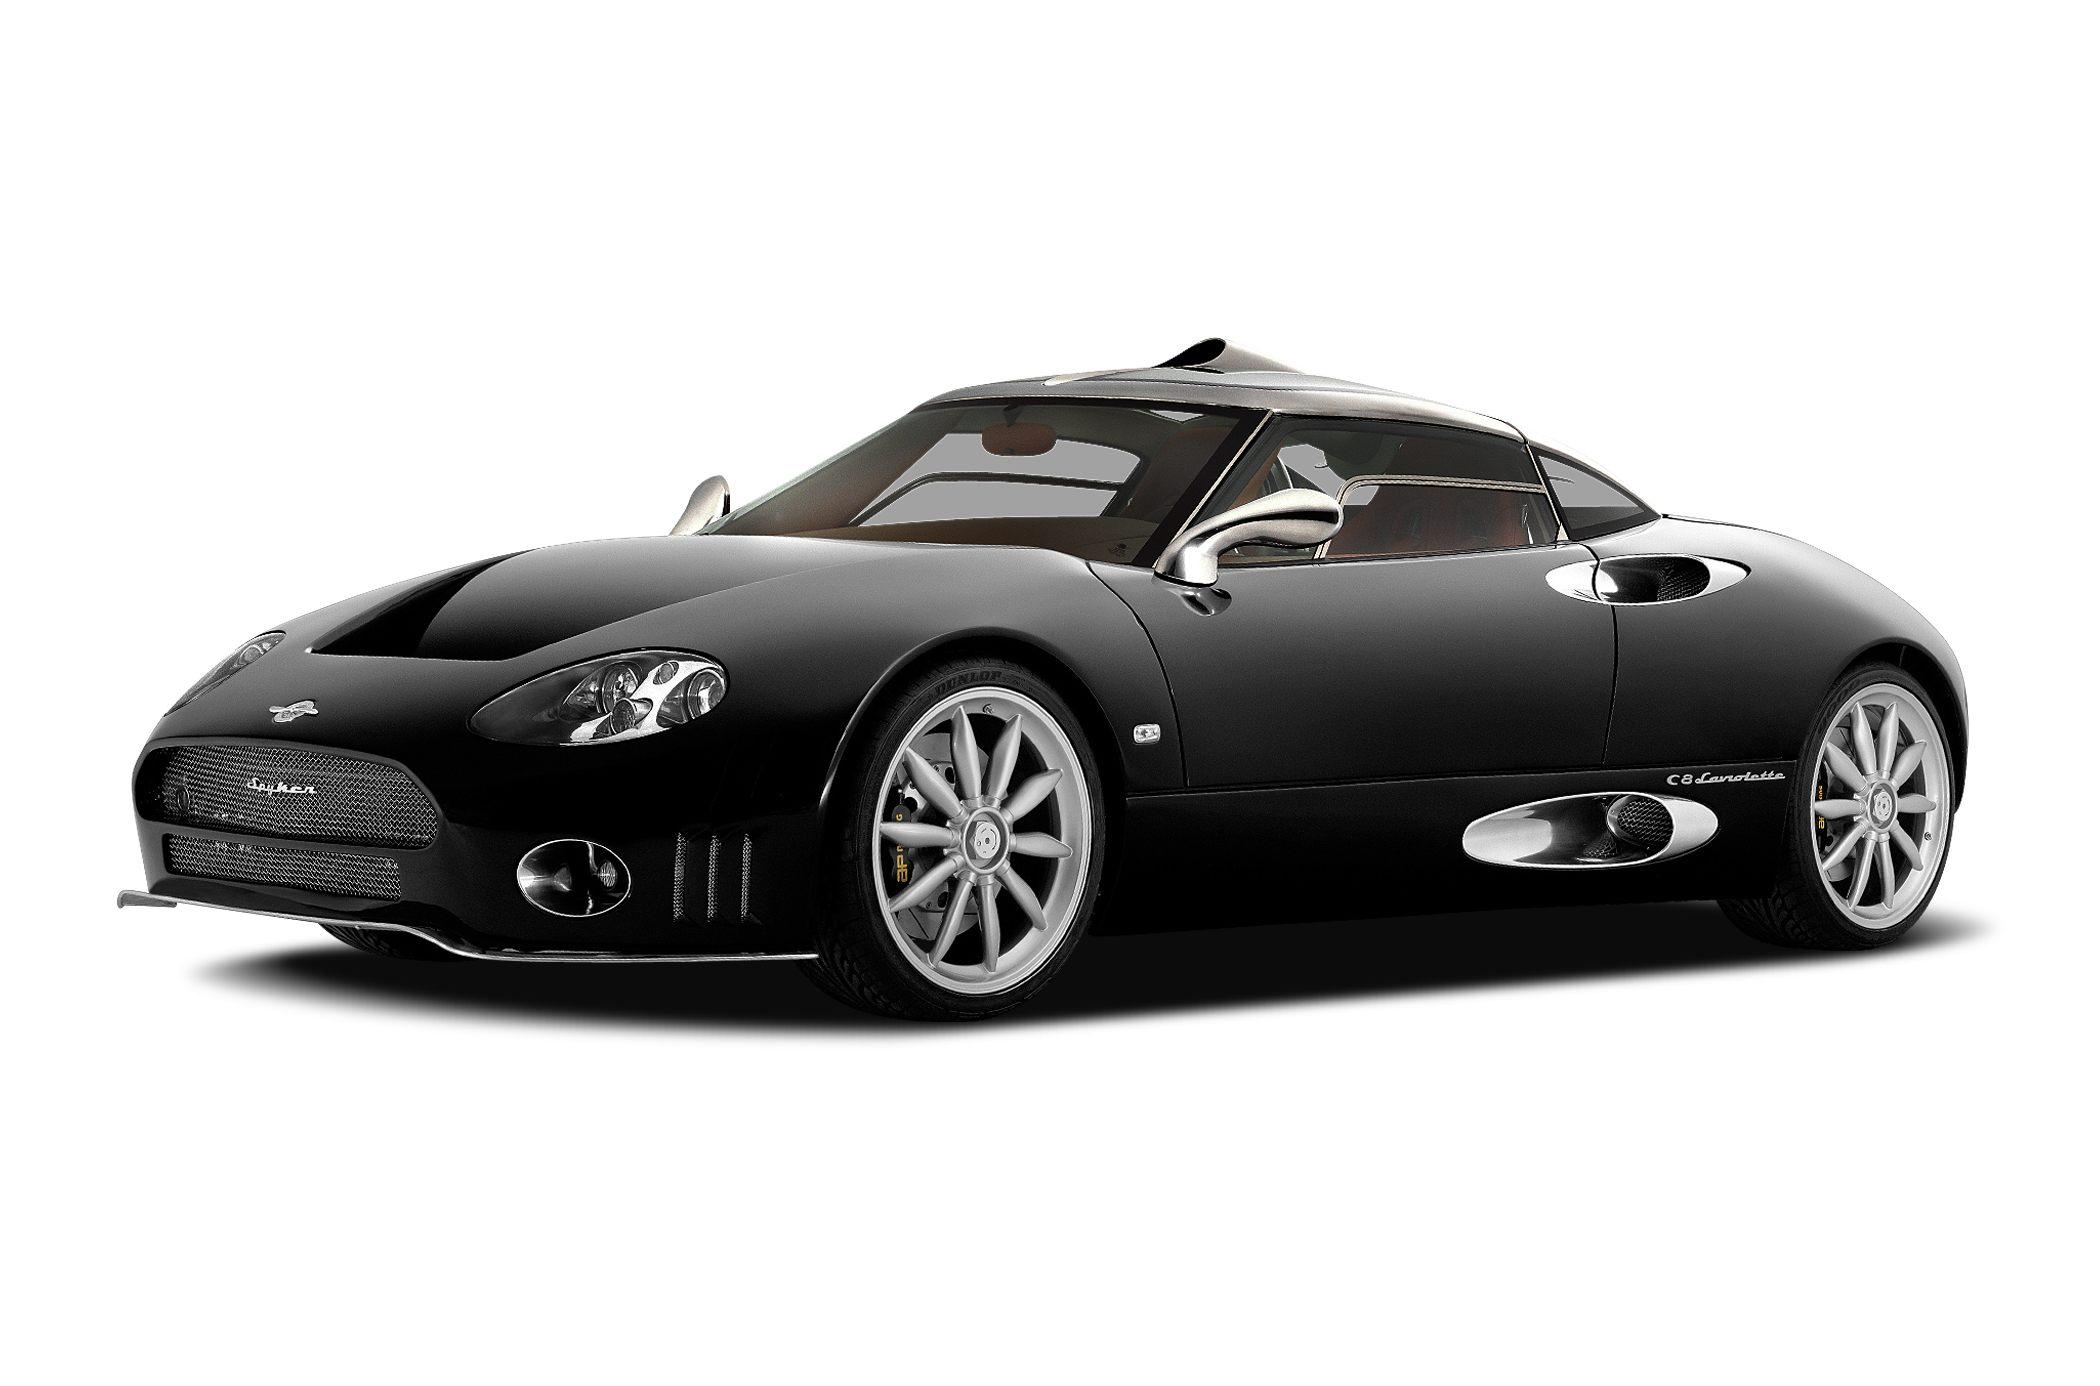 2007 Spyker C8 Laviolette